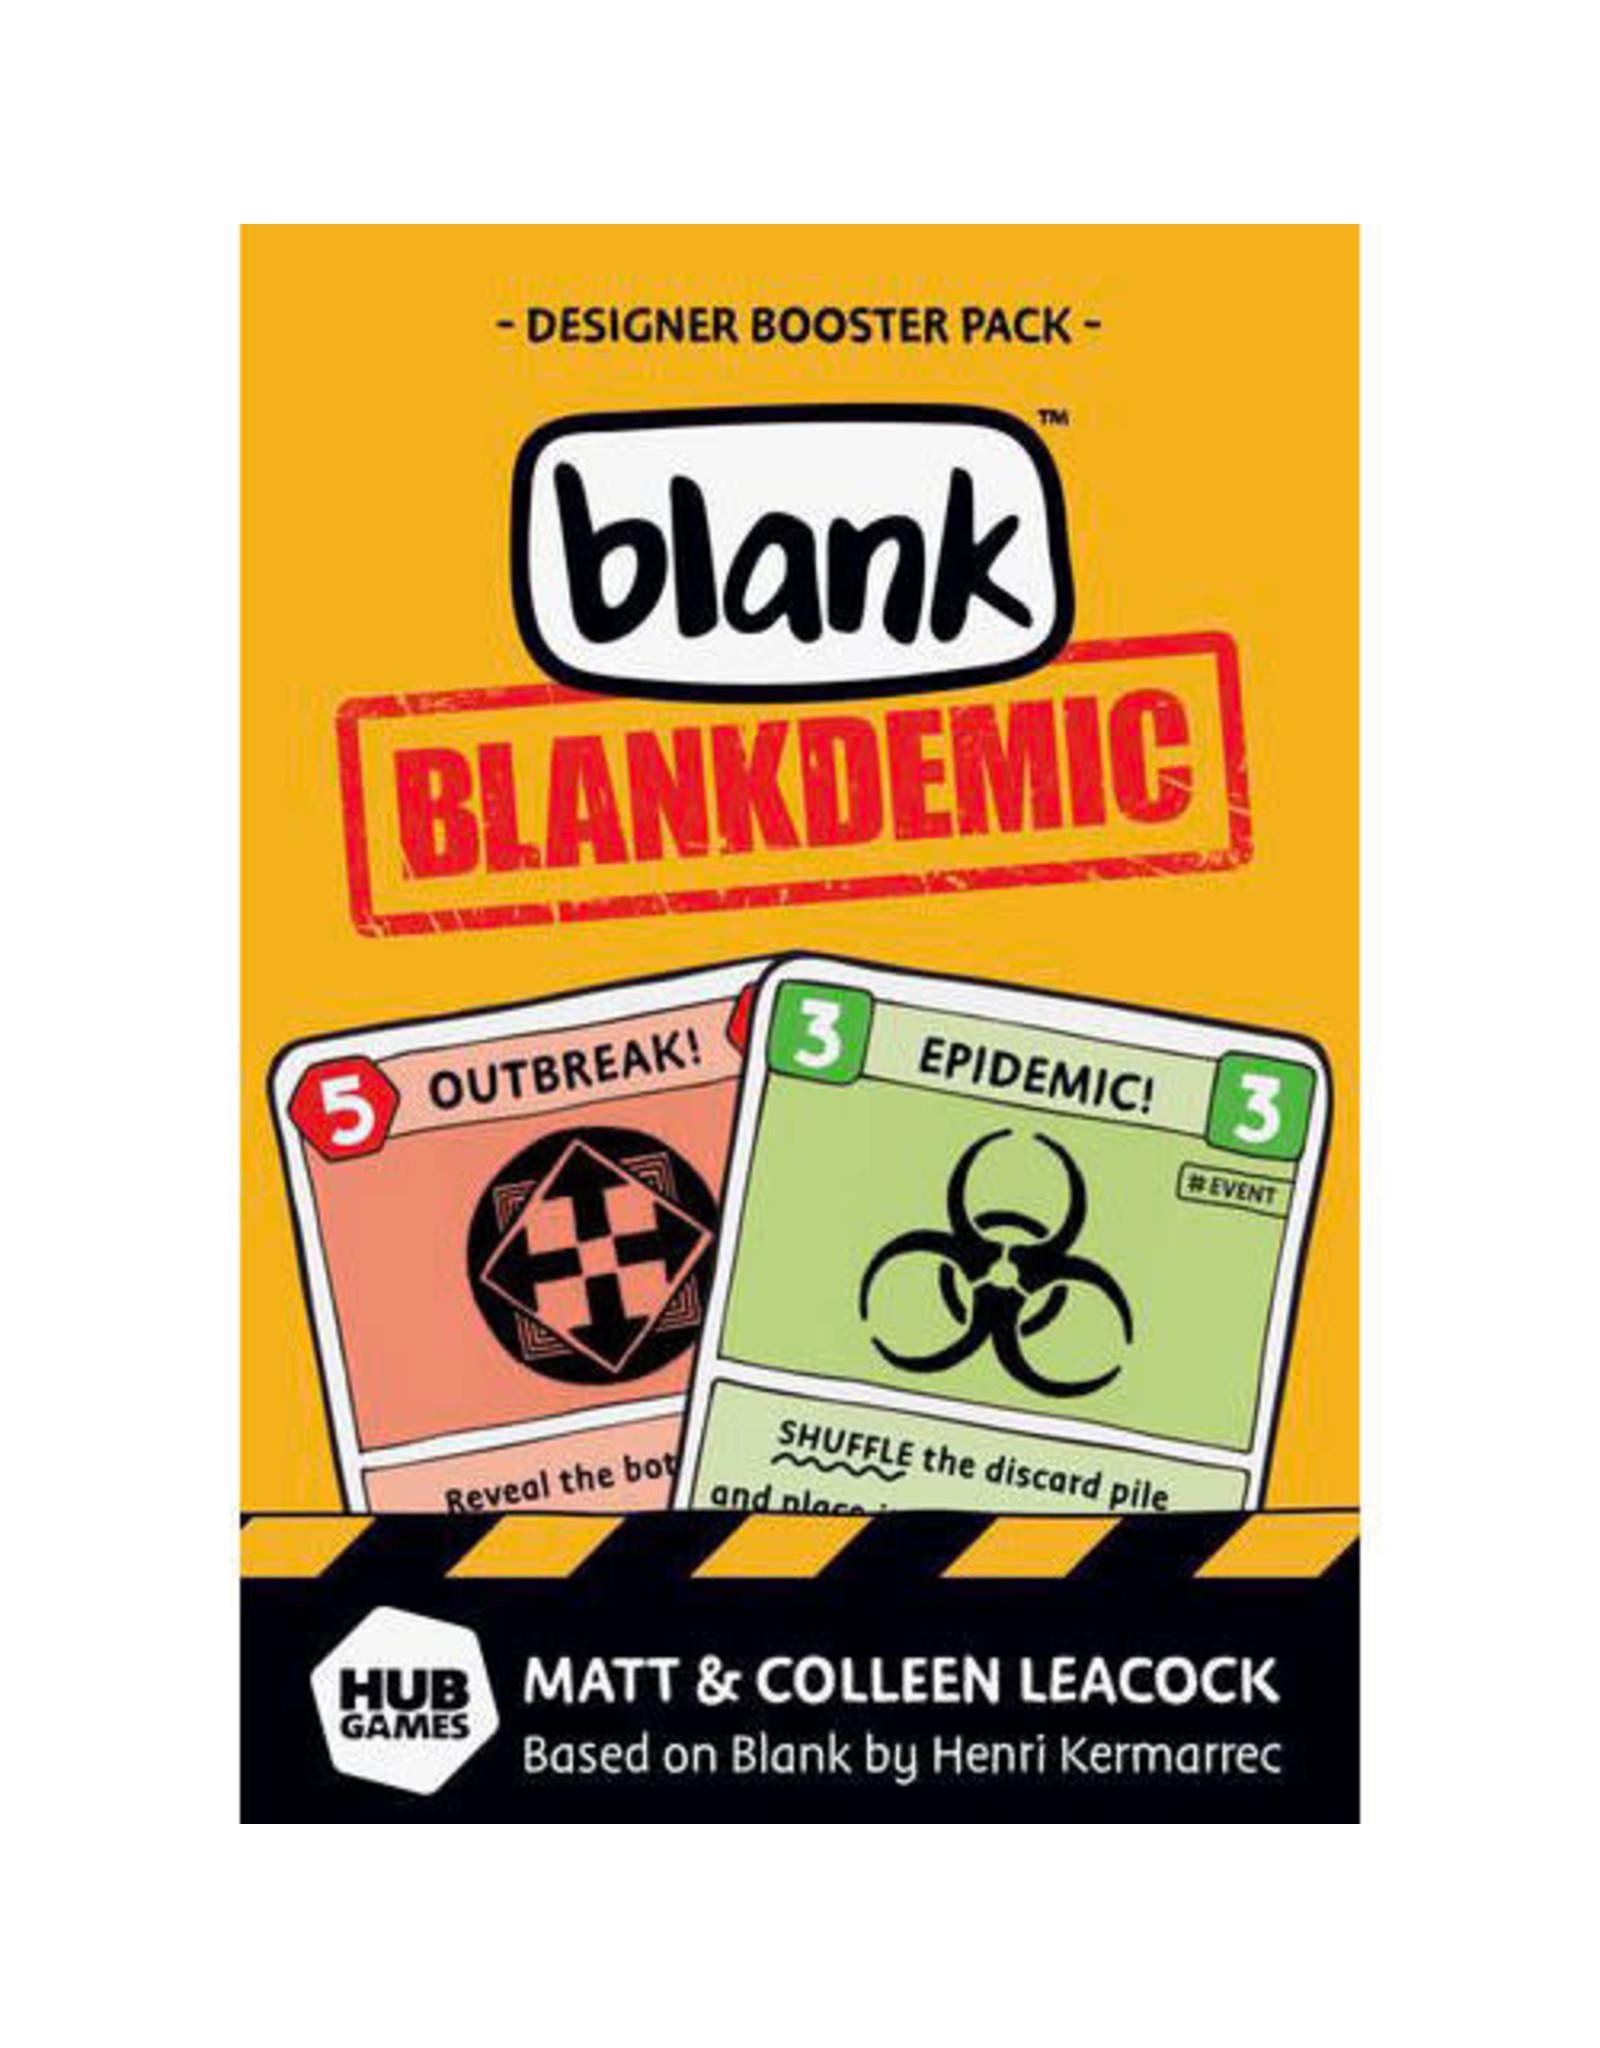 Blank: Blankdemic Expansion